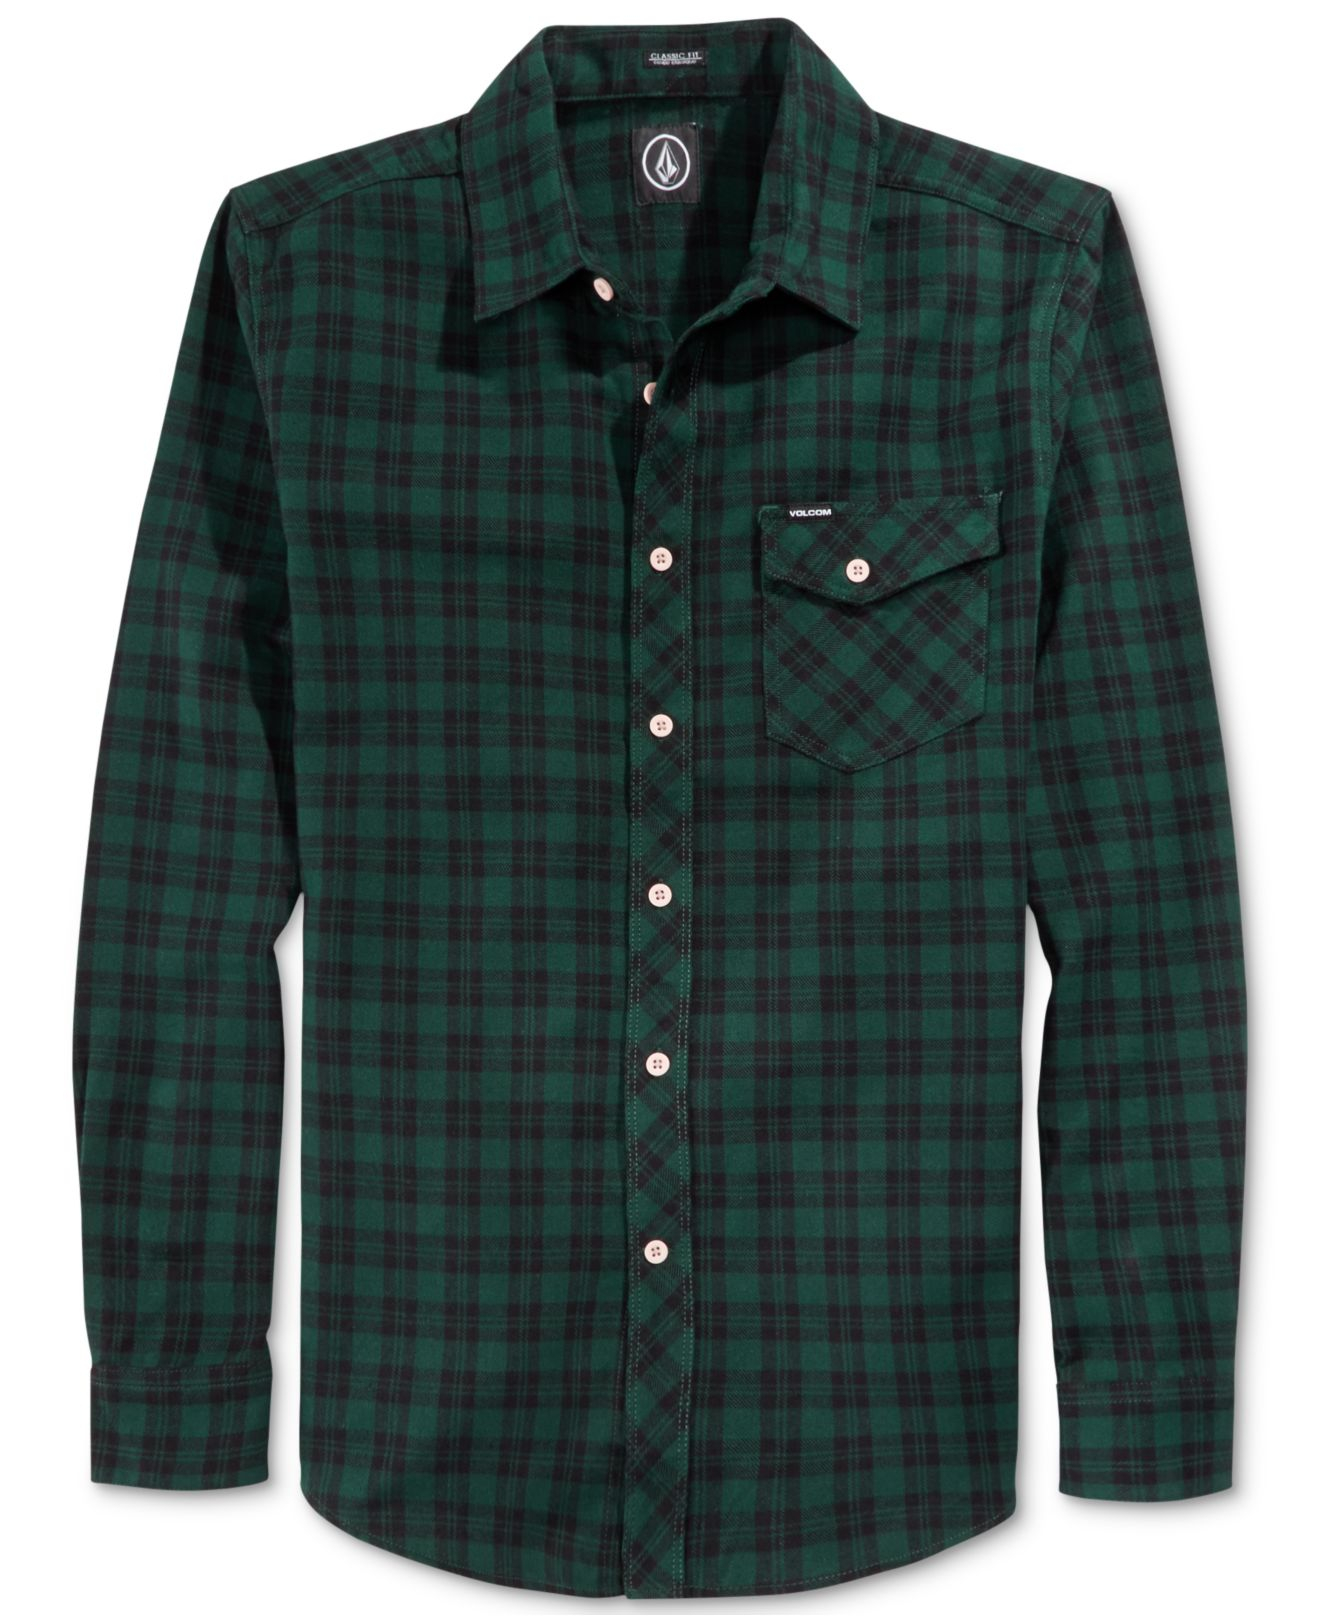 Lyst Volcom Flartin Plaid Flannel Shirt In Green For Men